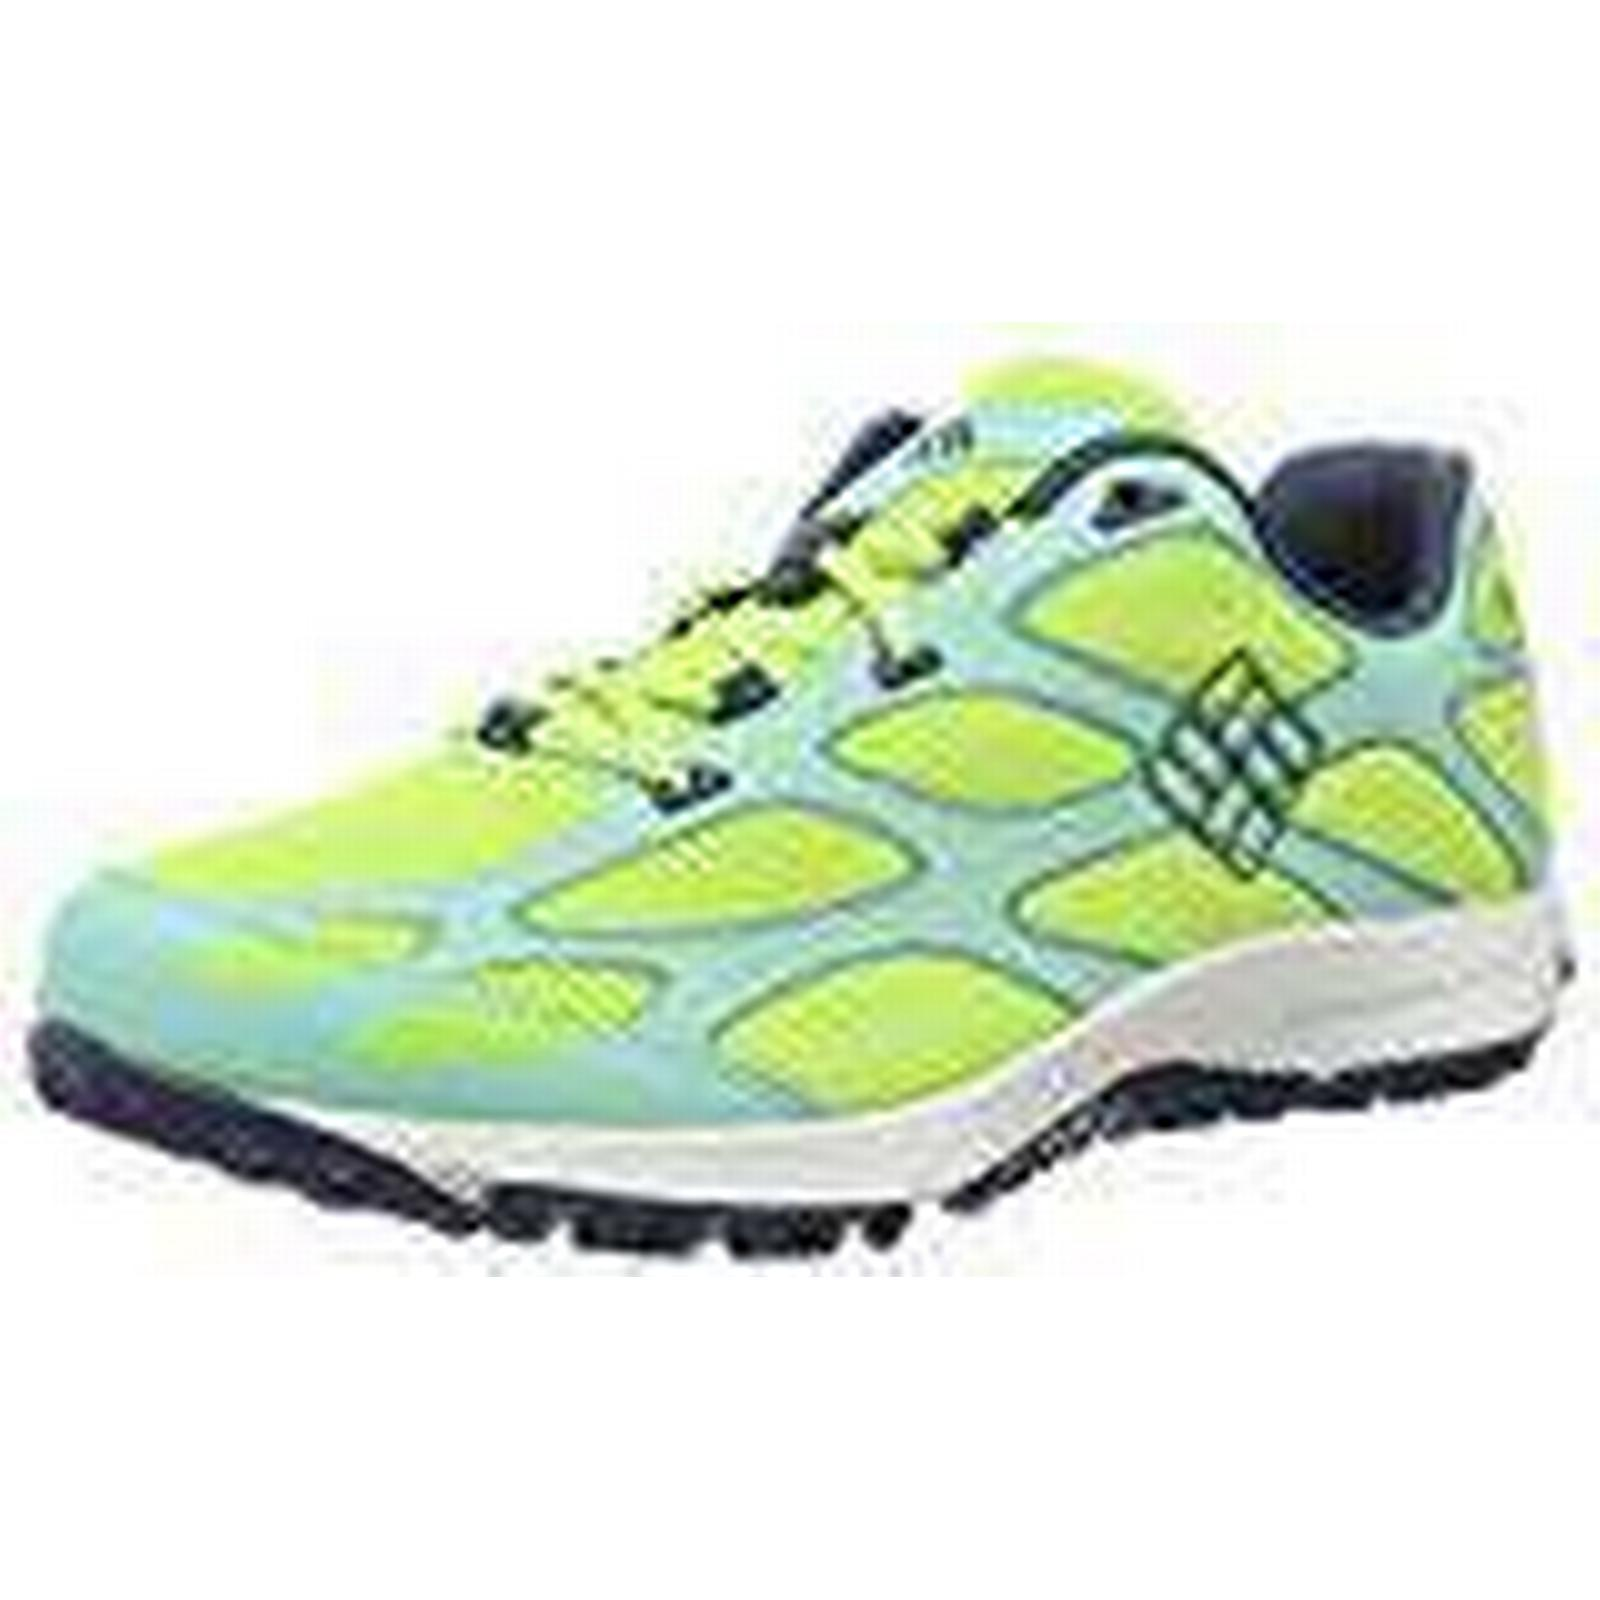 Columbia Women's Conspiracy Iv Outdry Multisport Outdoor 332), Shoes, Green (Jade Lime/Zinc 332), Outdoor 8 UK 41 EU e6e11f